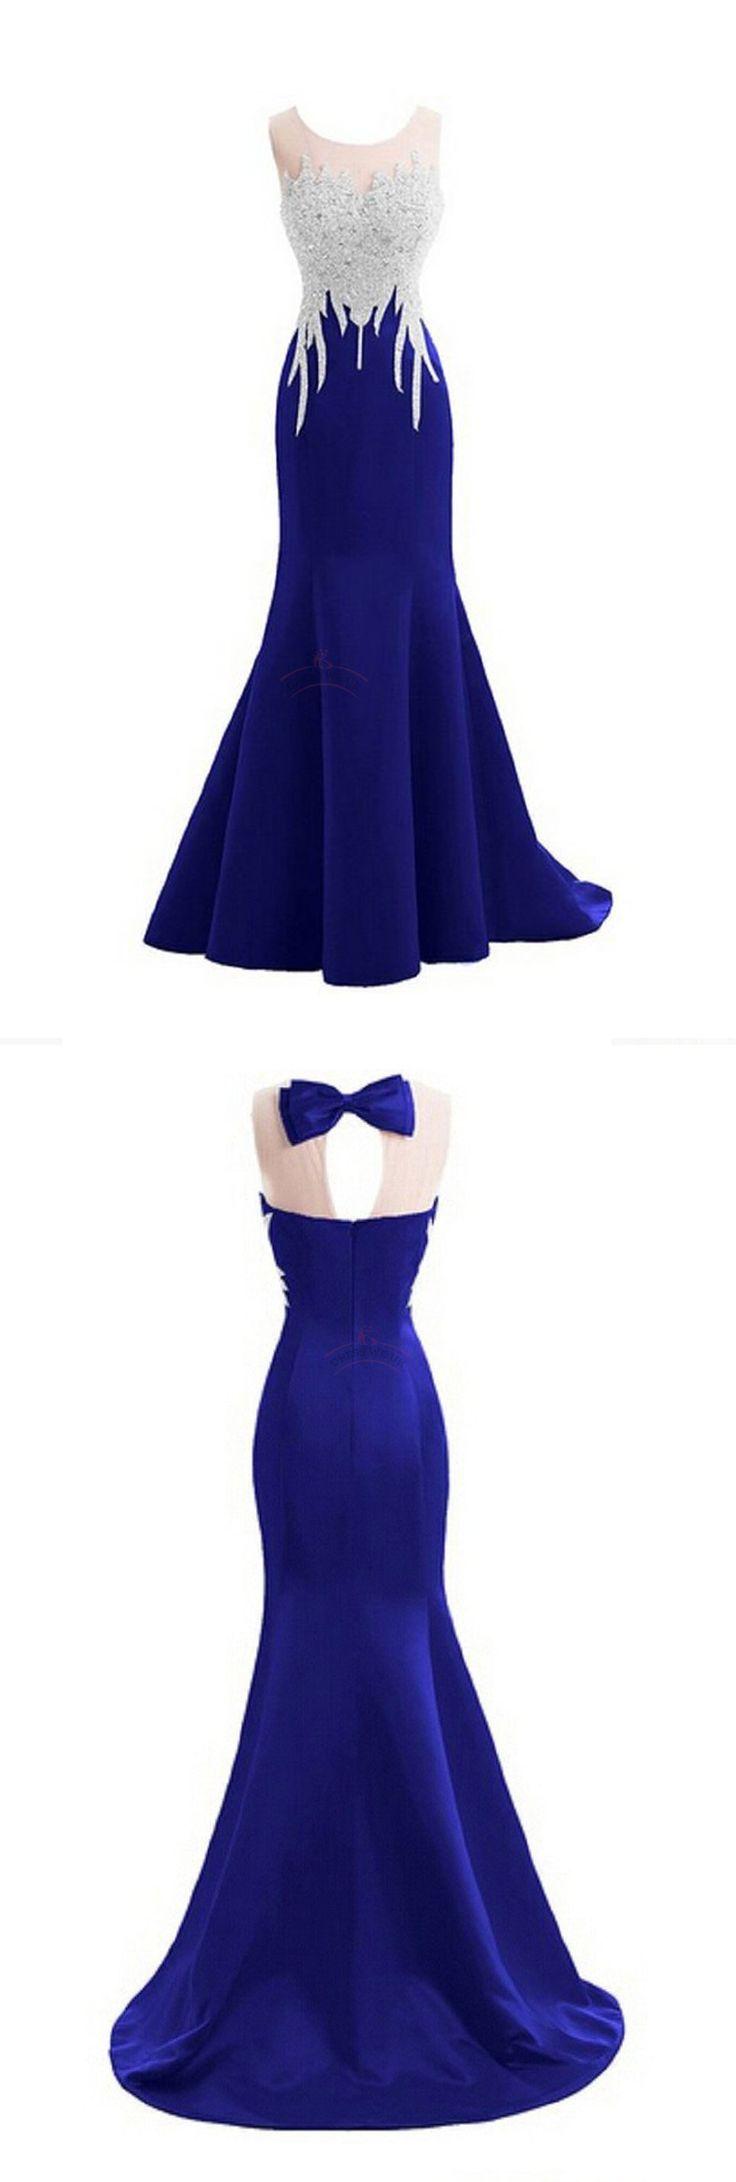 Nice sparkly crystal prom dressesmermaid prom dressessexy backless